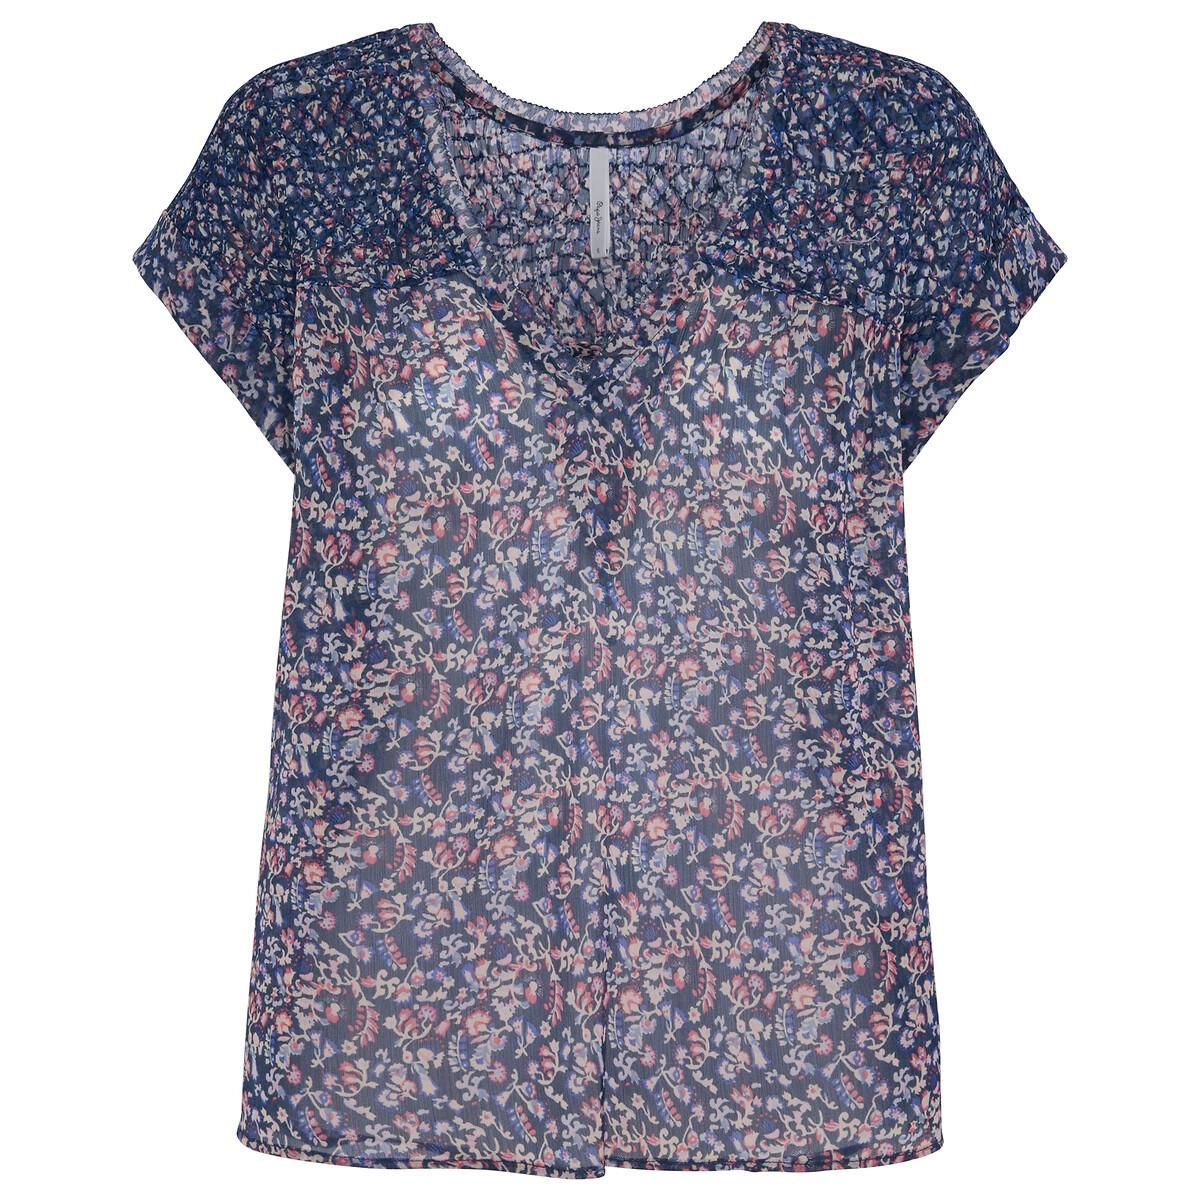 Blusa de mangas curtas, estampado florido